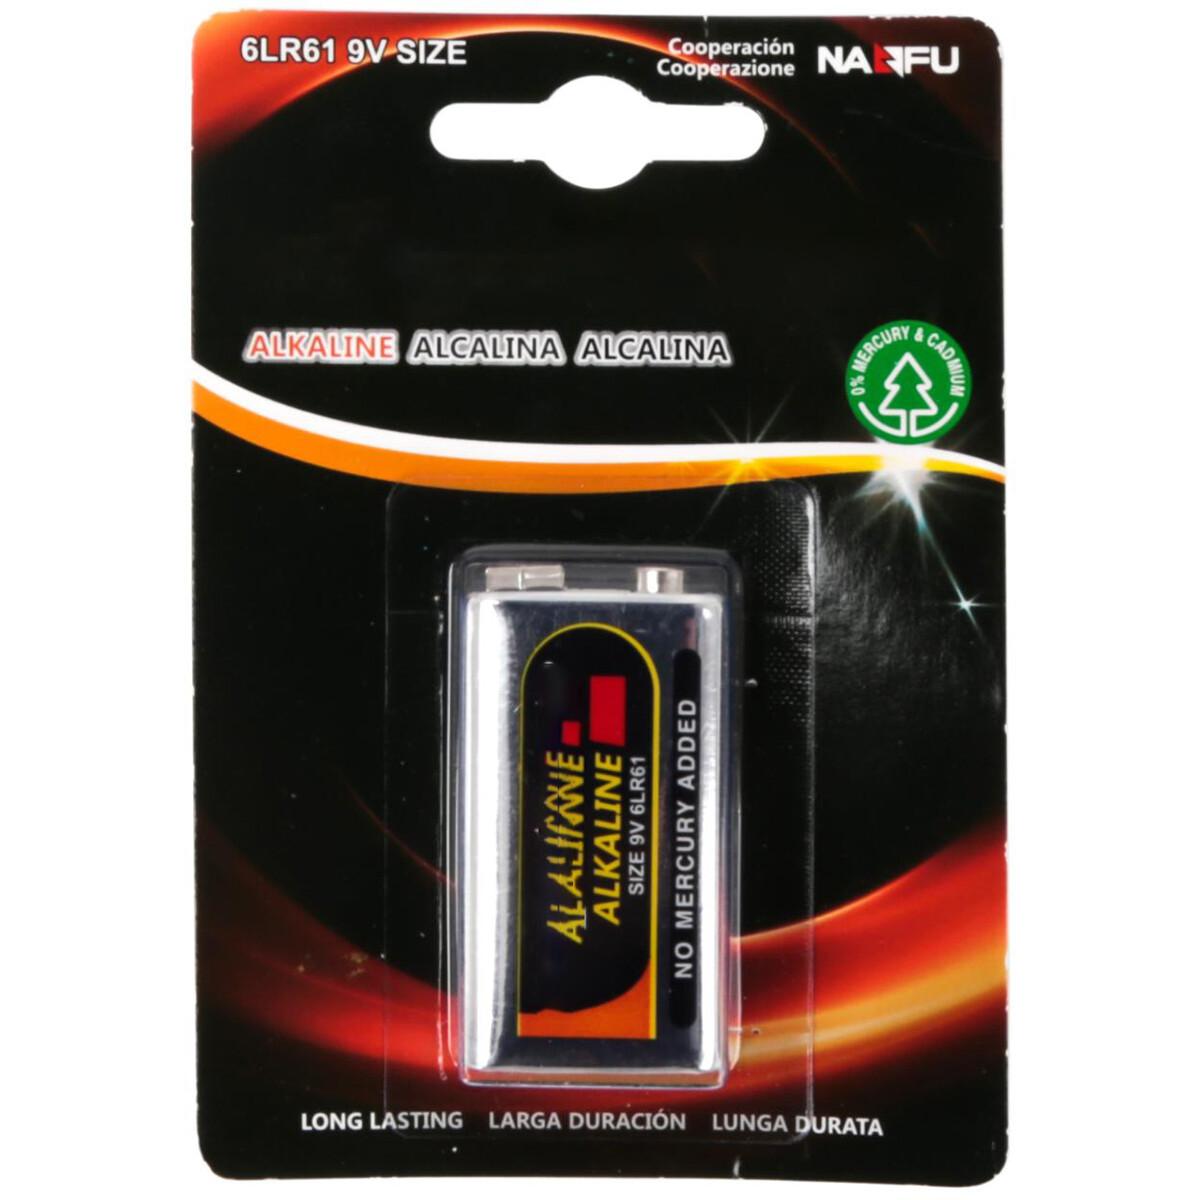 Blokbatterij - Aigi Dei - 6LR61 - 9V - Alkaline Batterijen - 1 Stuk